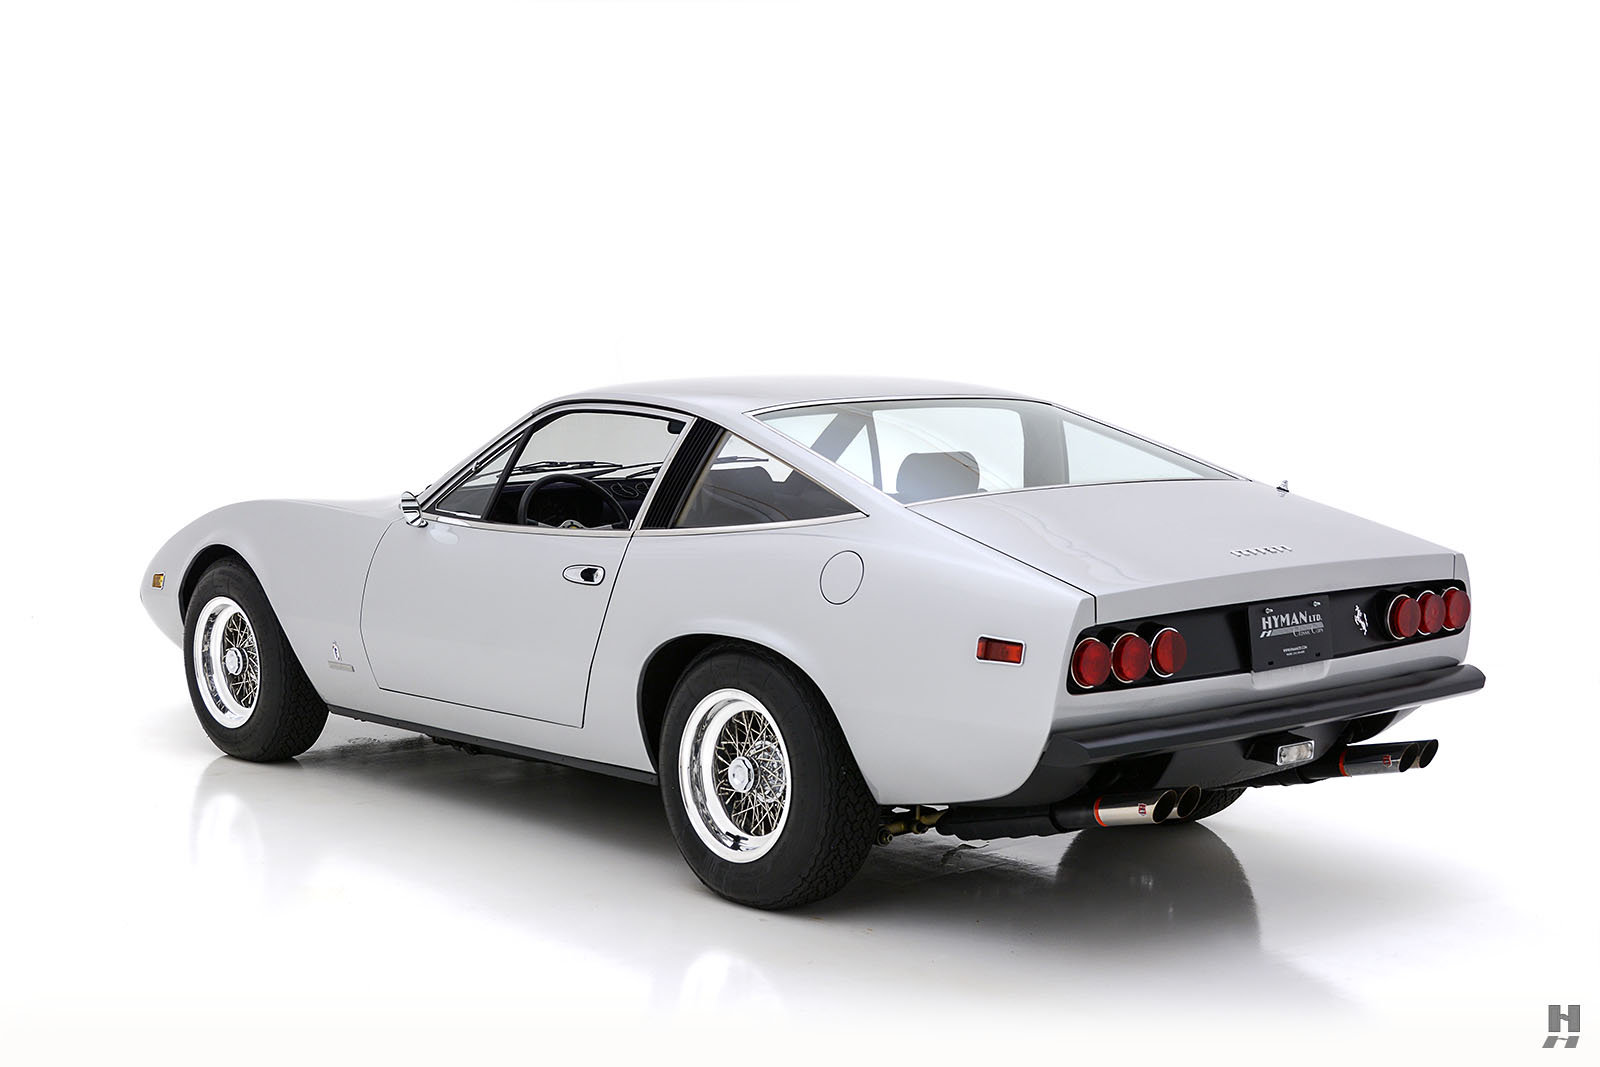 1972 FERRARI 365 GTC/4 COUPE For Sale (picture 6 of 6)